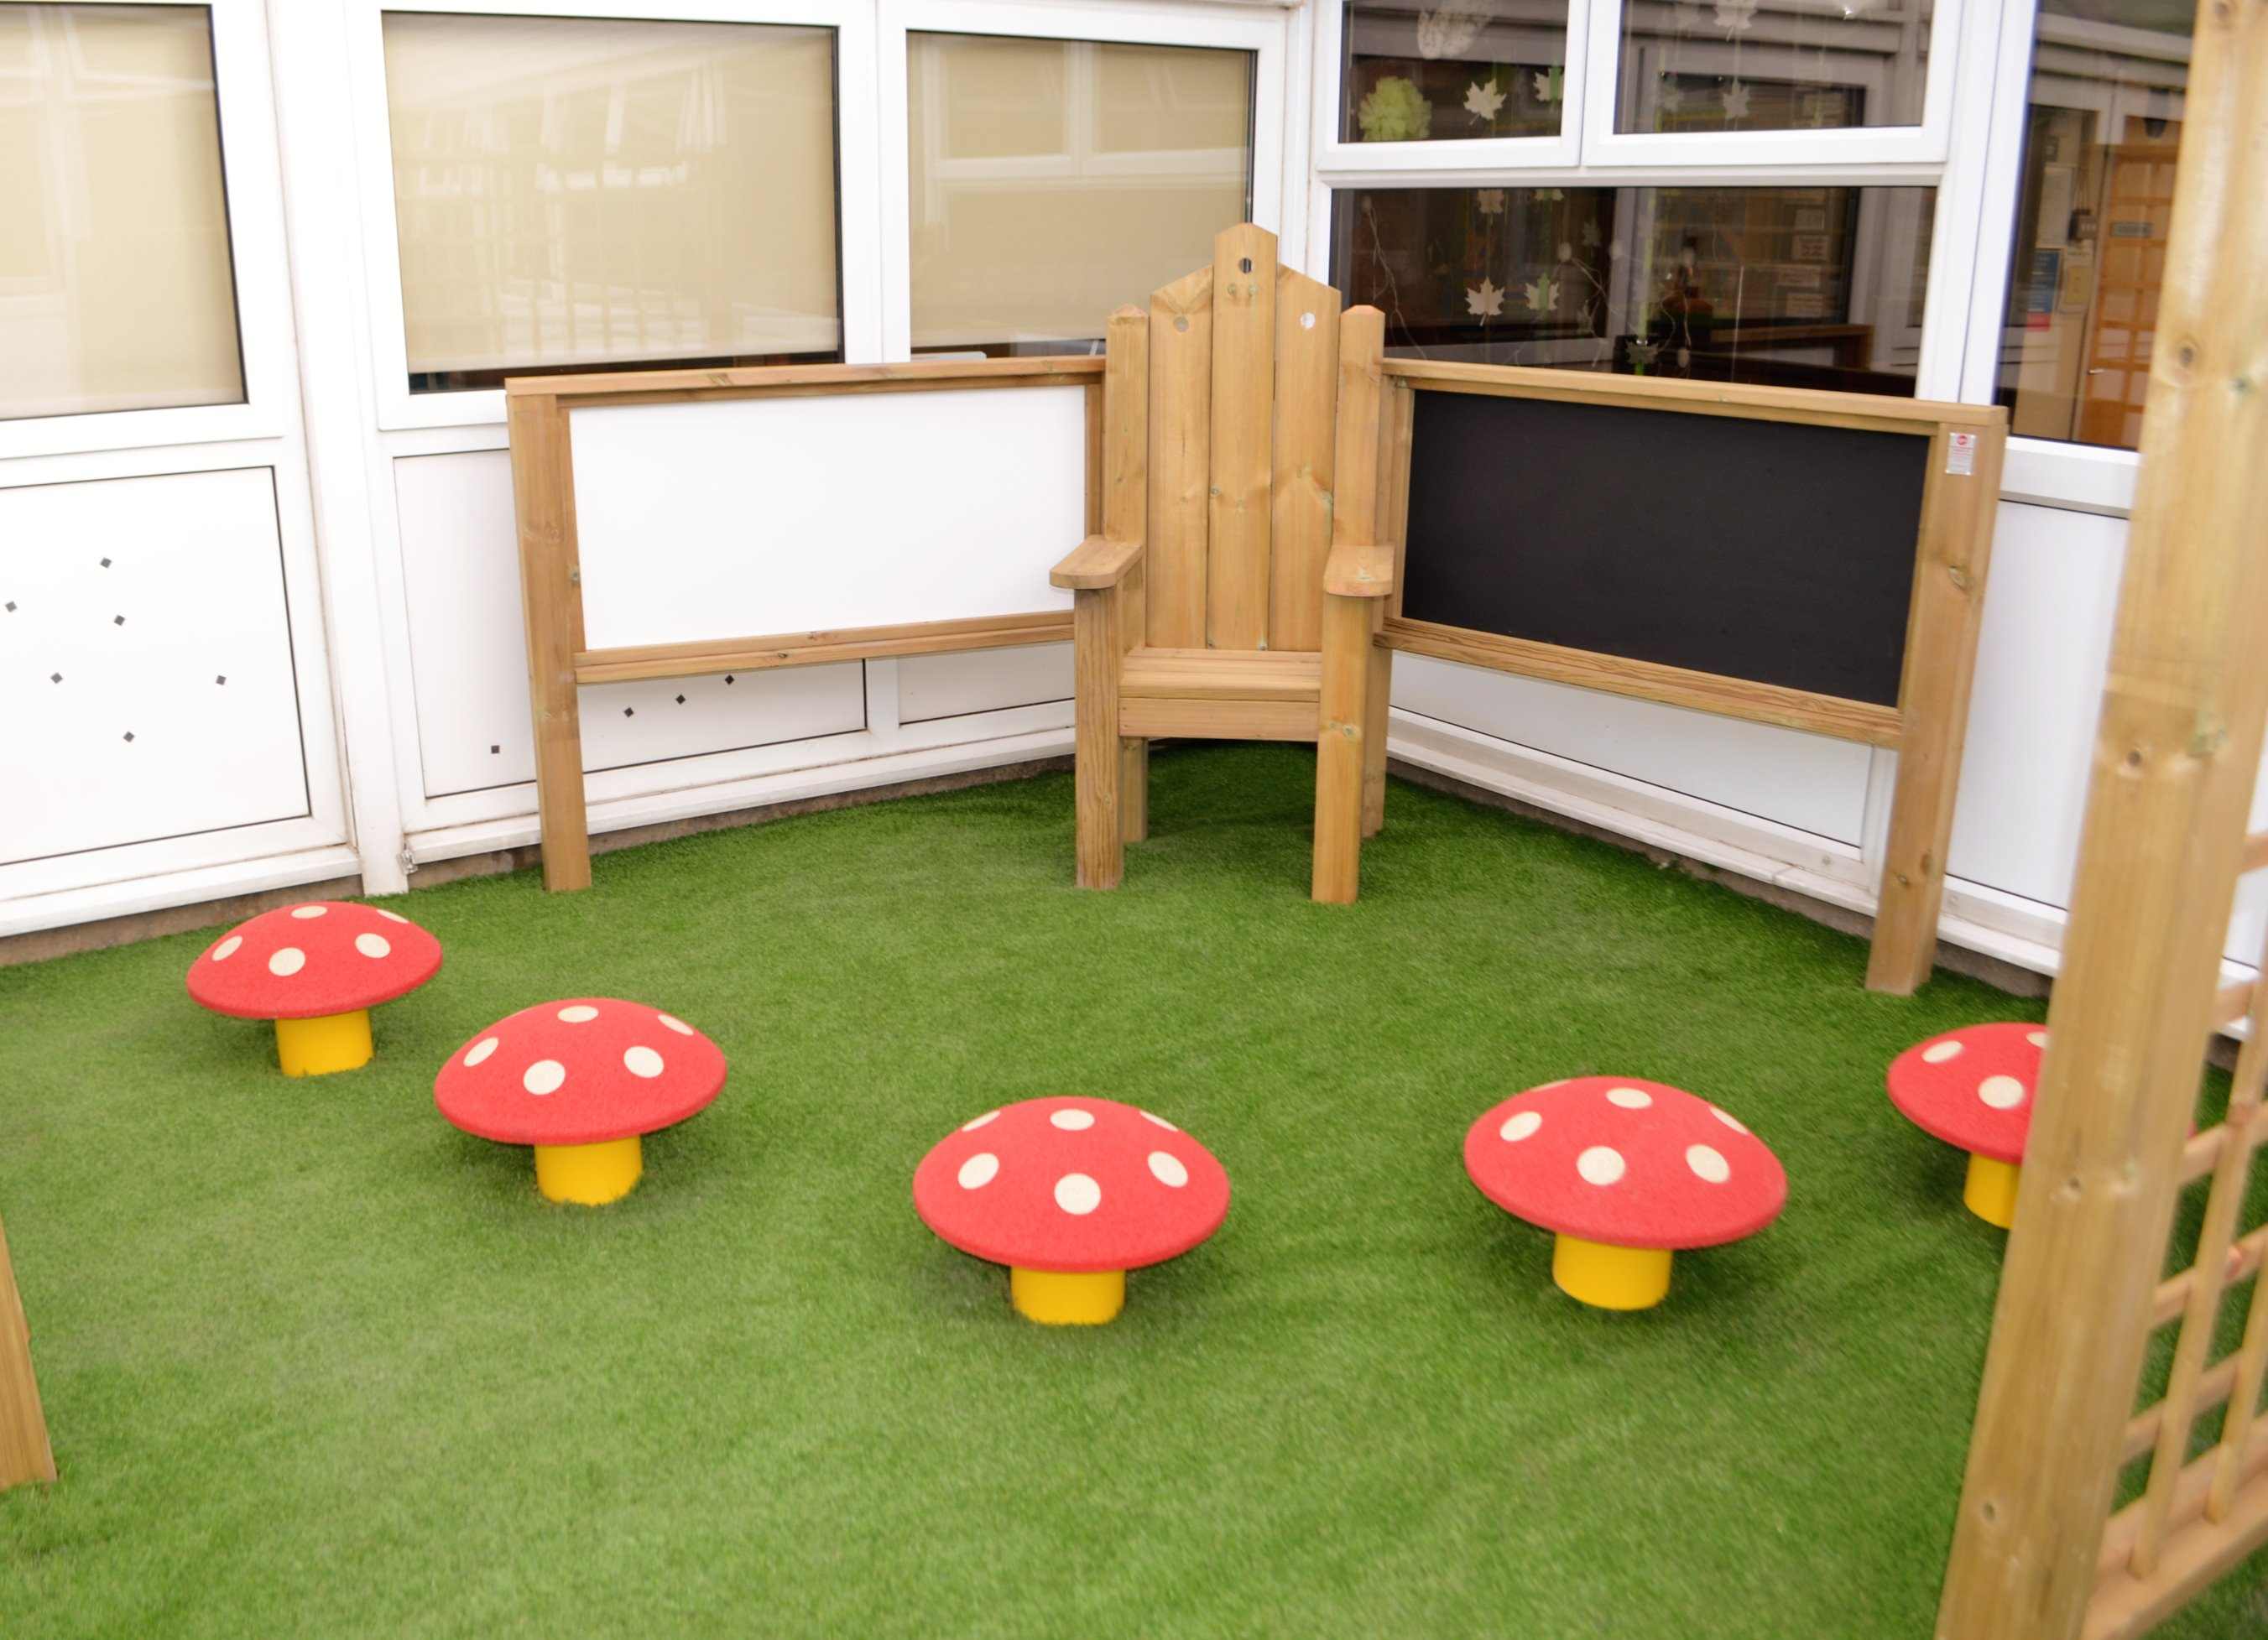 mushroom-seats-furniture-playgrounds-5_e